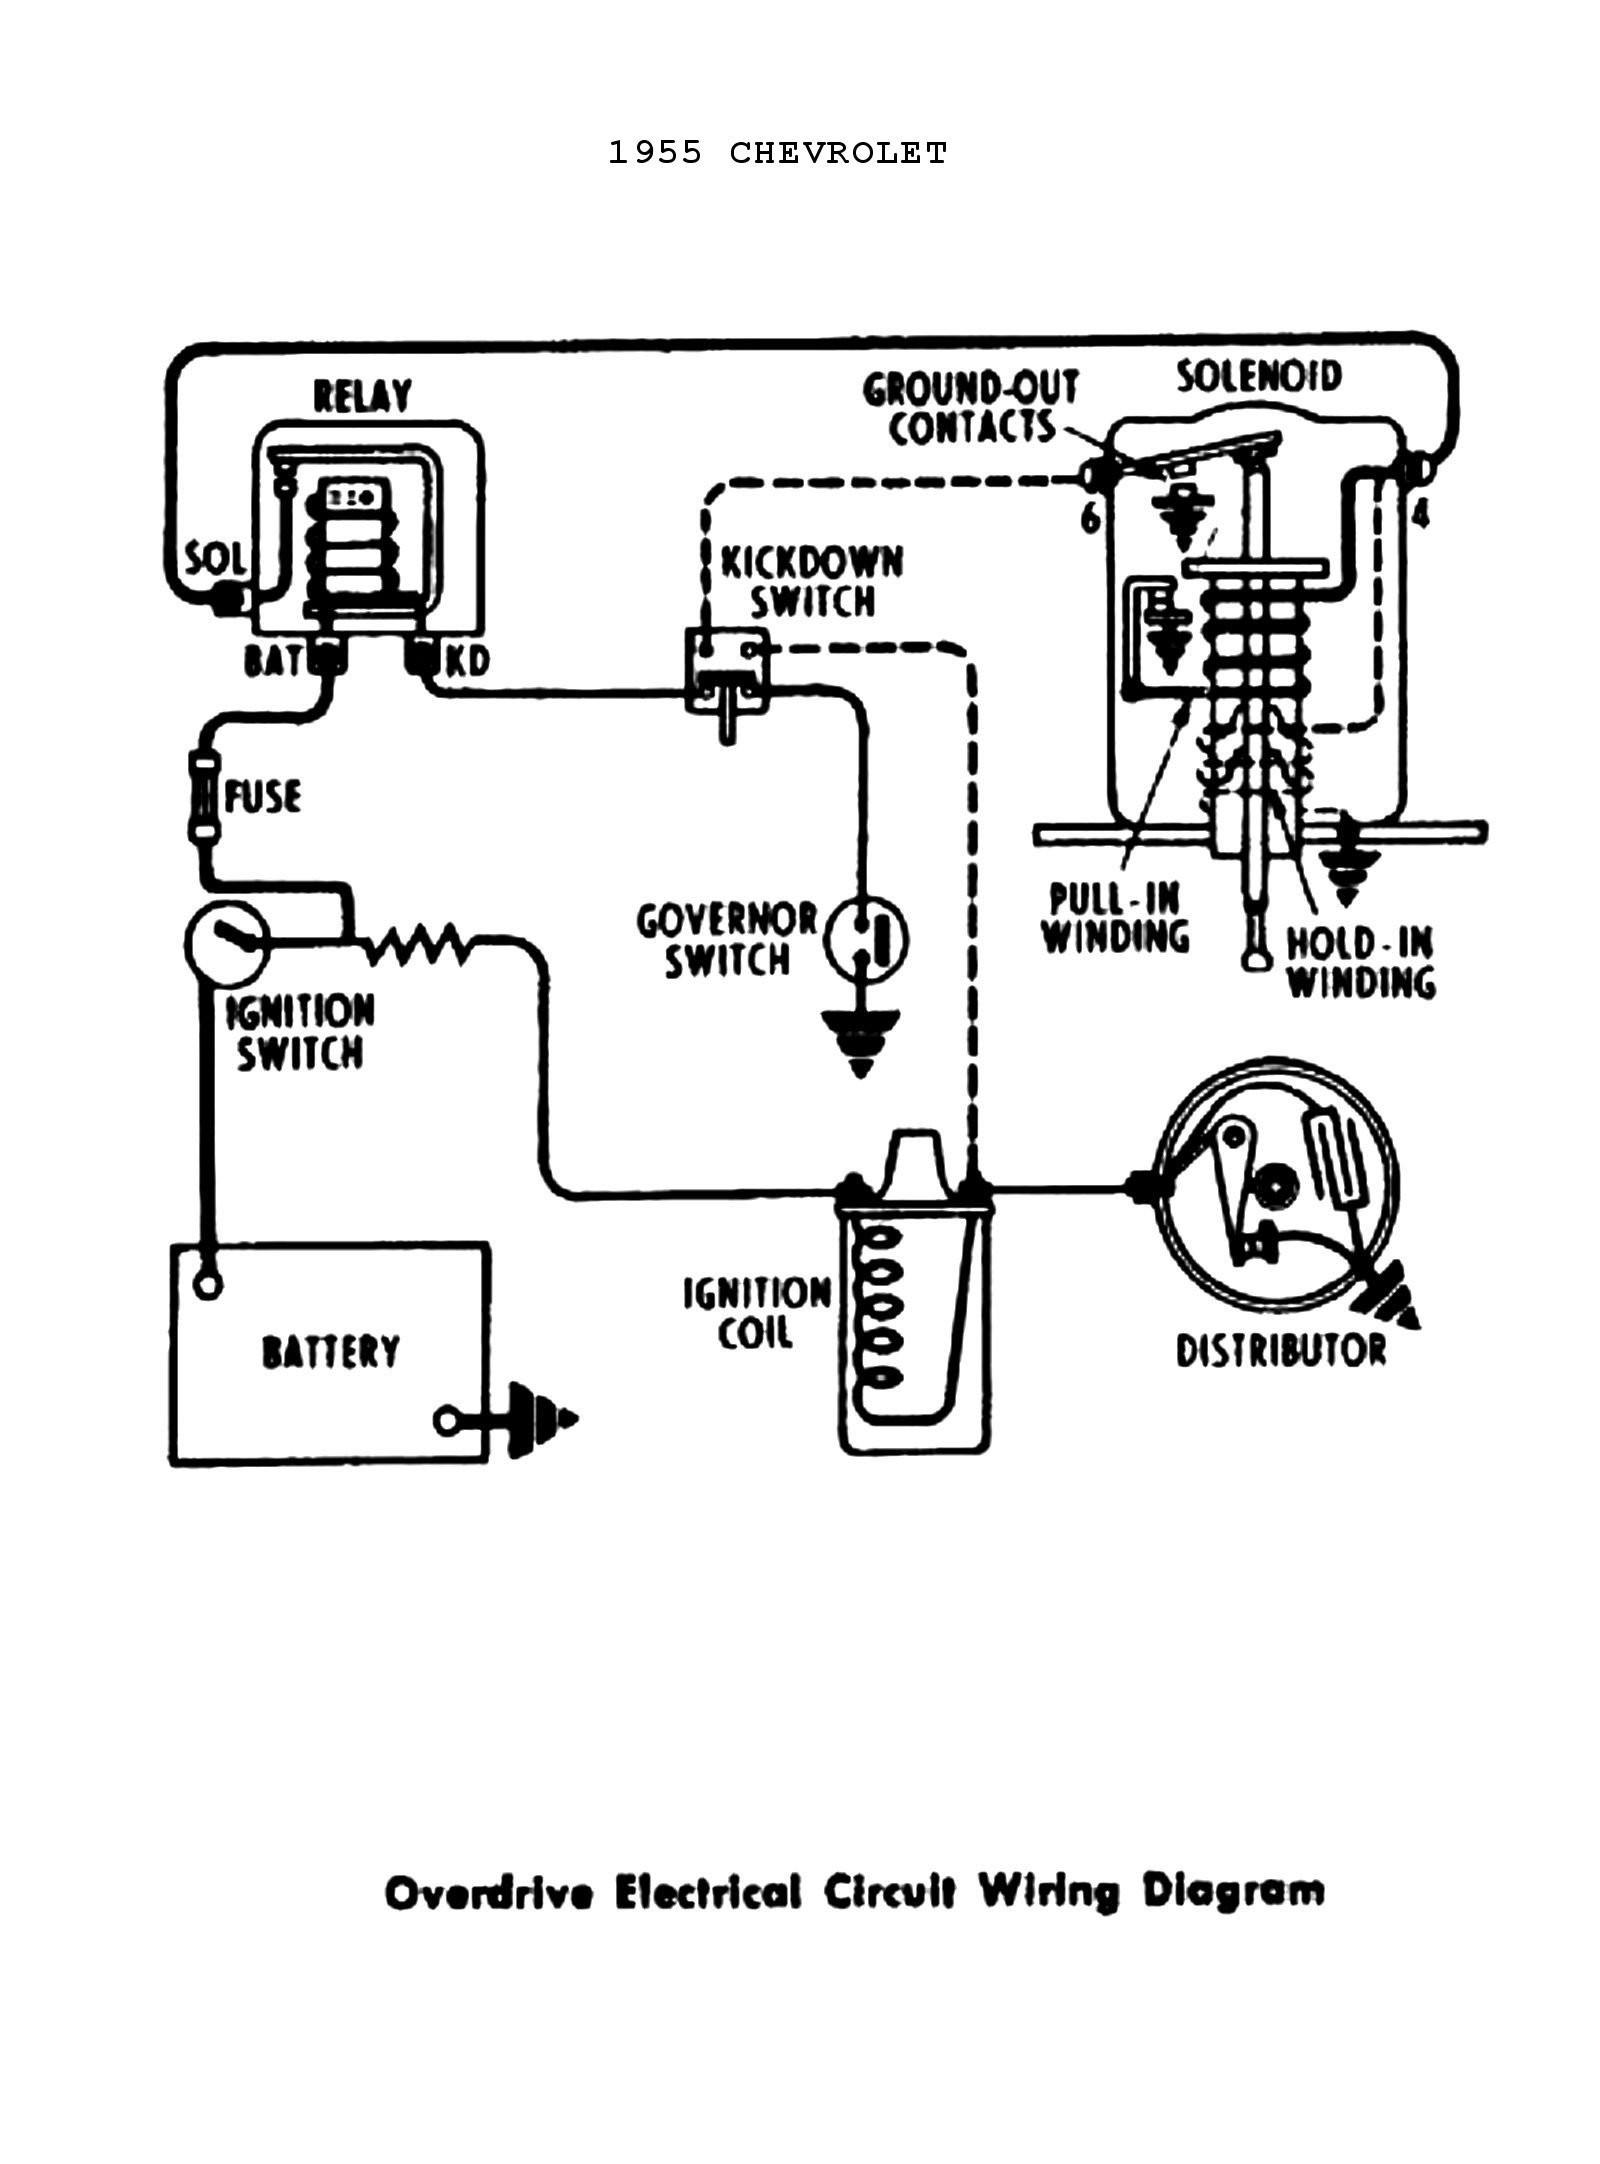 basic ignition wiring diagram unique wiring diagram image rh mainetreasurechest com ignition switch circuit diagram ignition coil circuit diagram